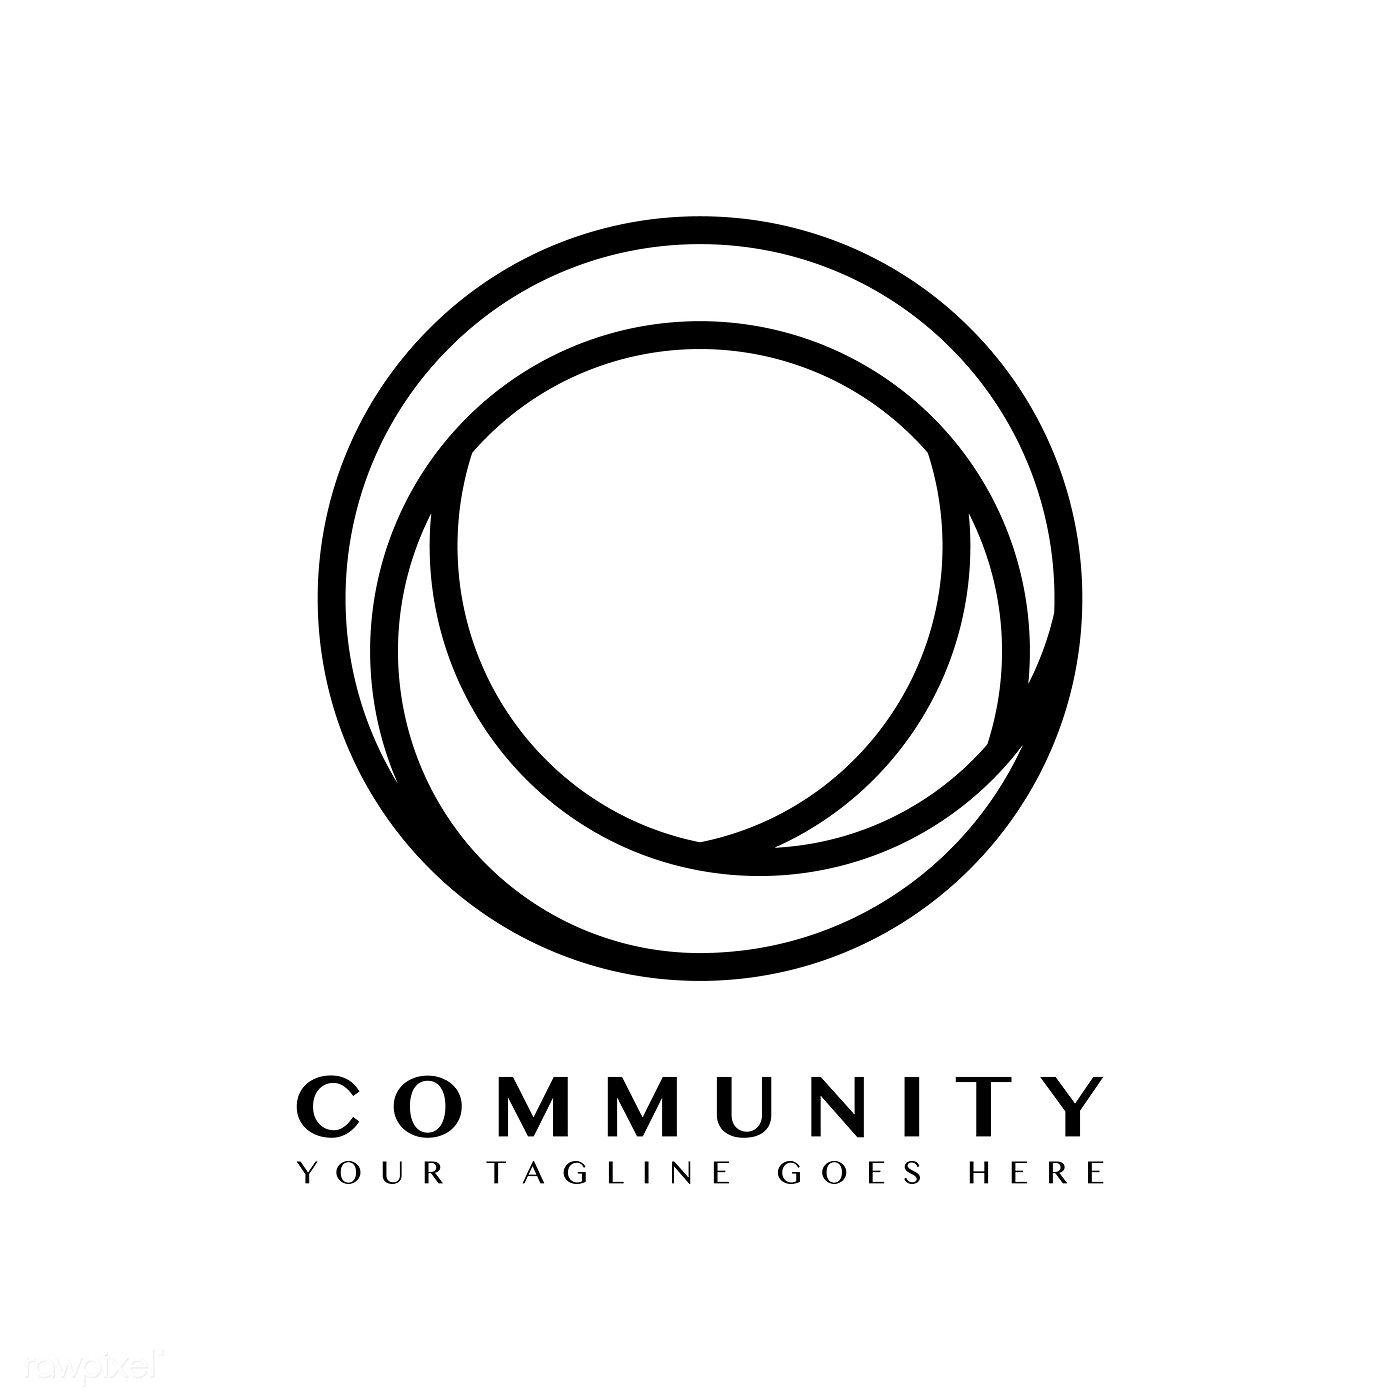 Download free vector of Community branding logo design sample 503748 -   10 planting Logo branding ideas